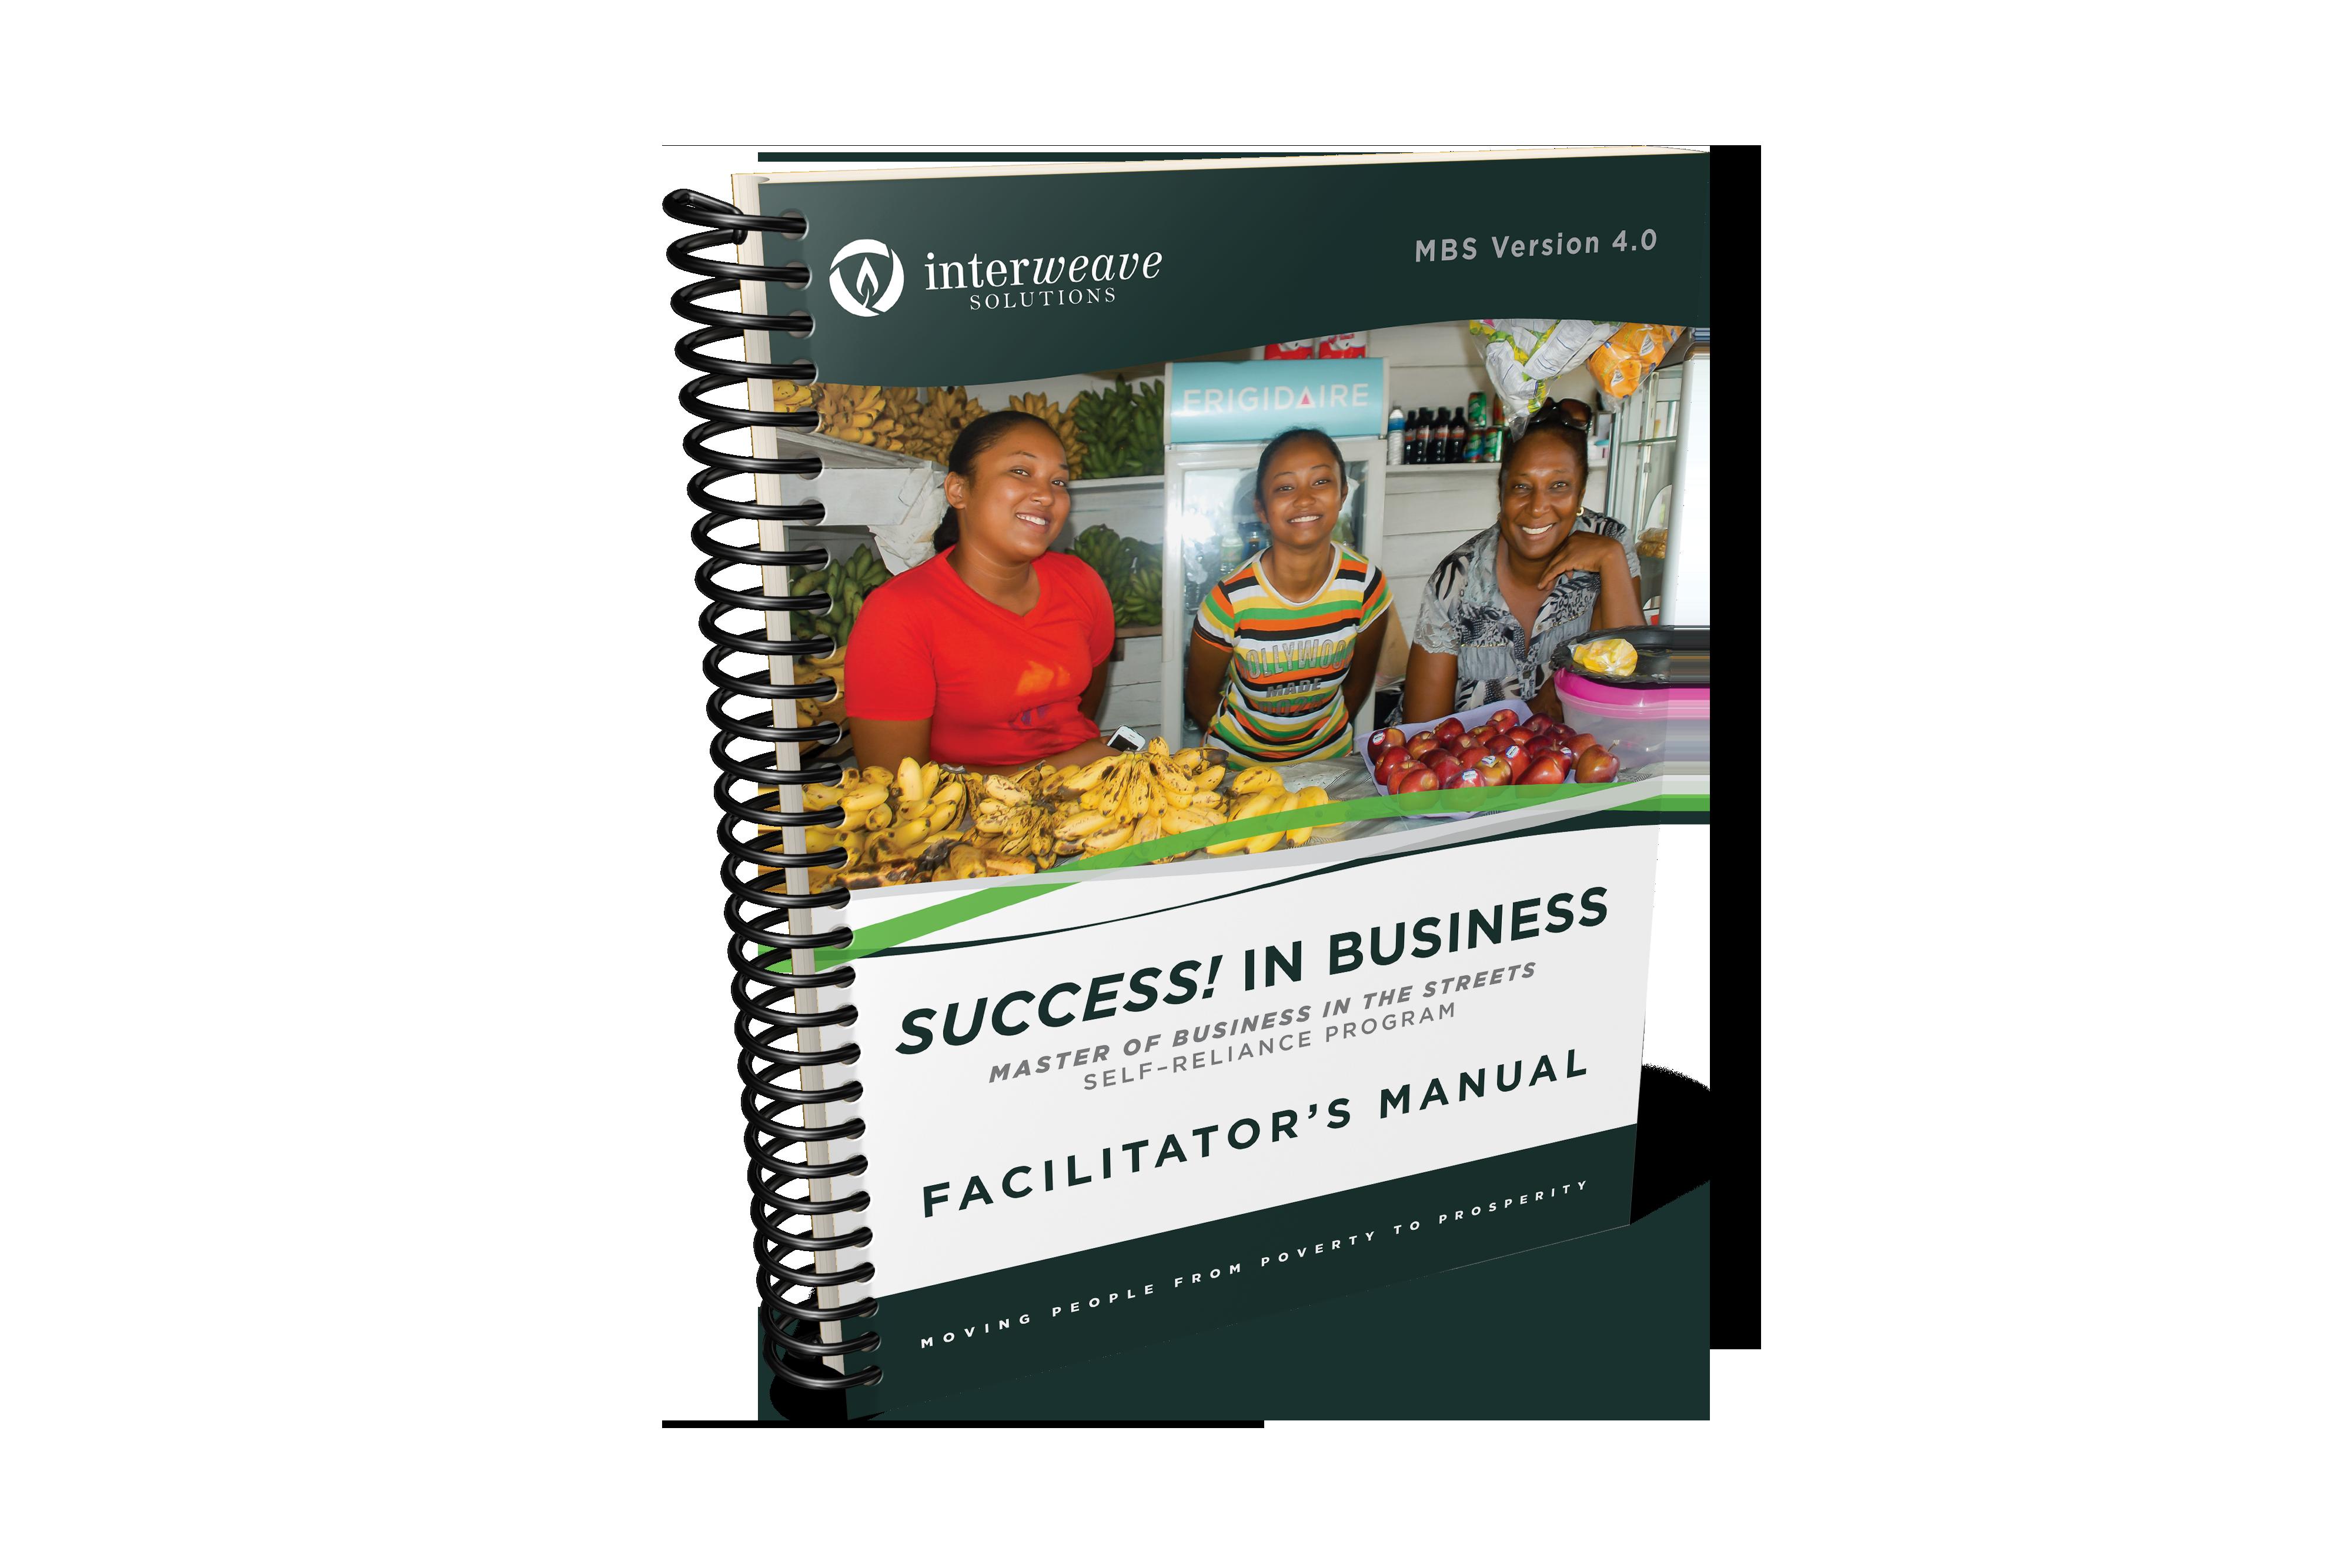 To download the Facilitator's Manual, please click:  Facilitator's Manual